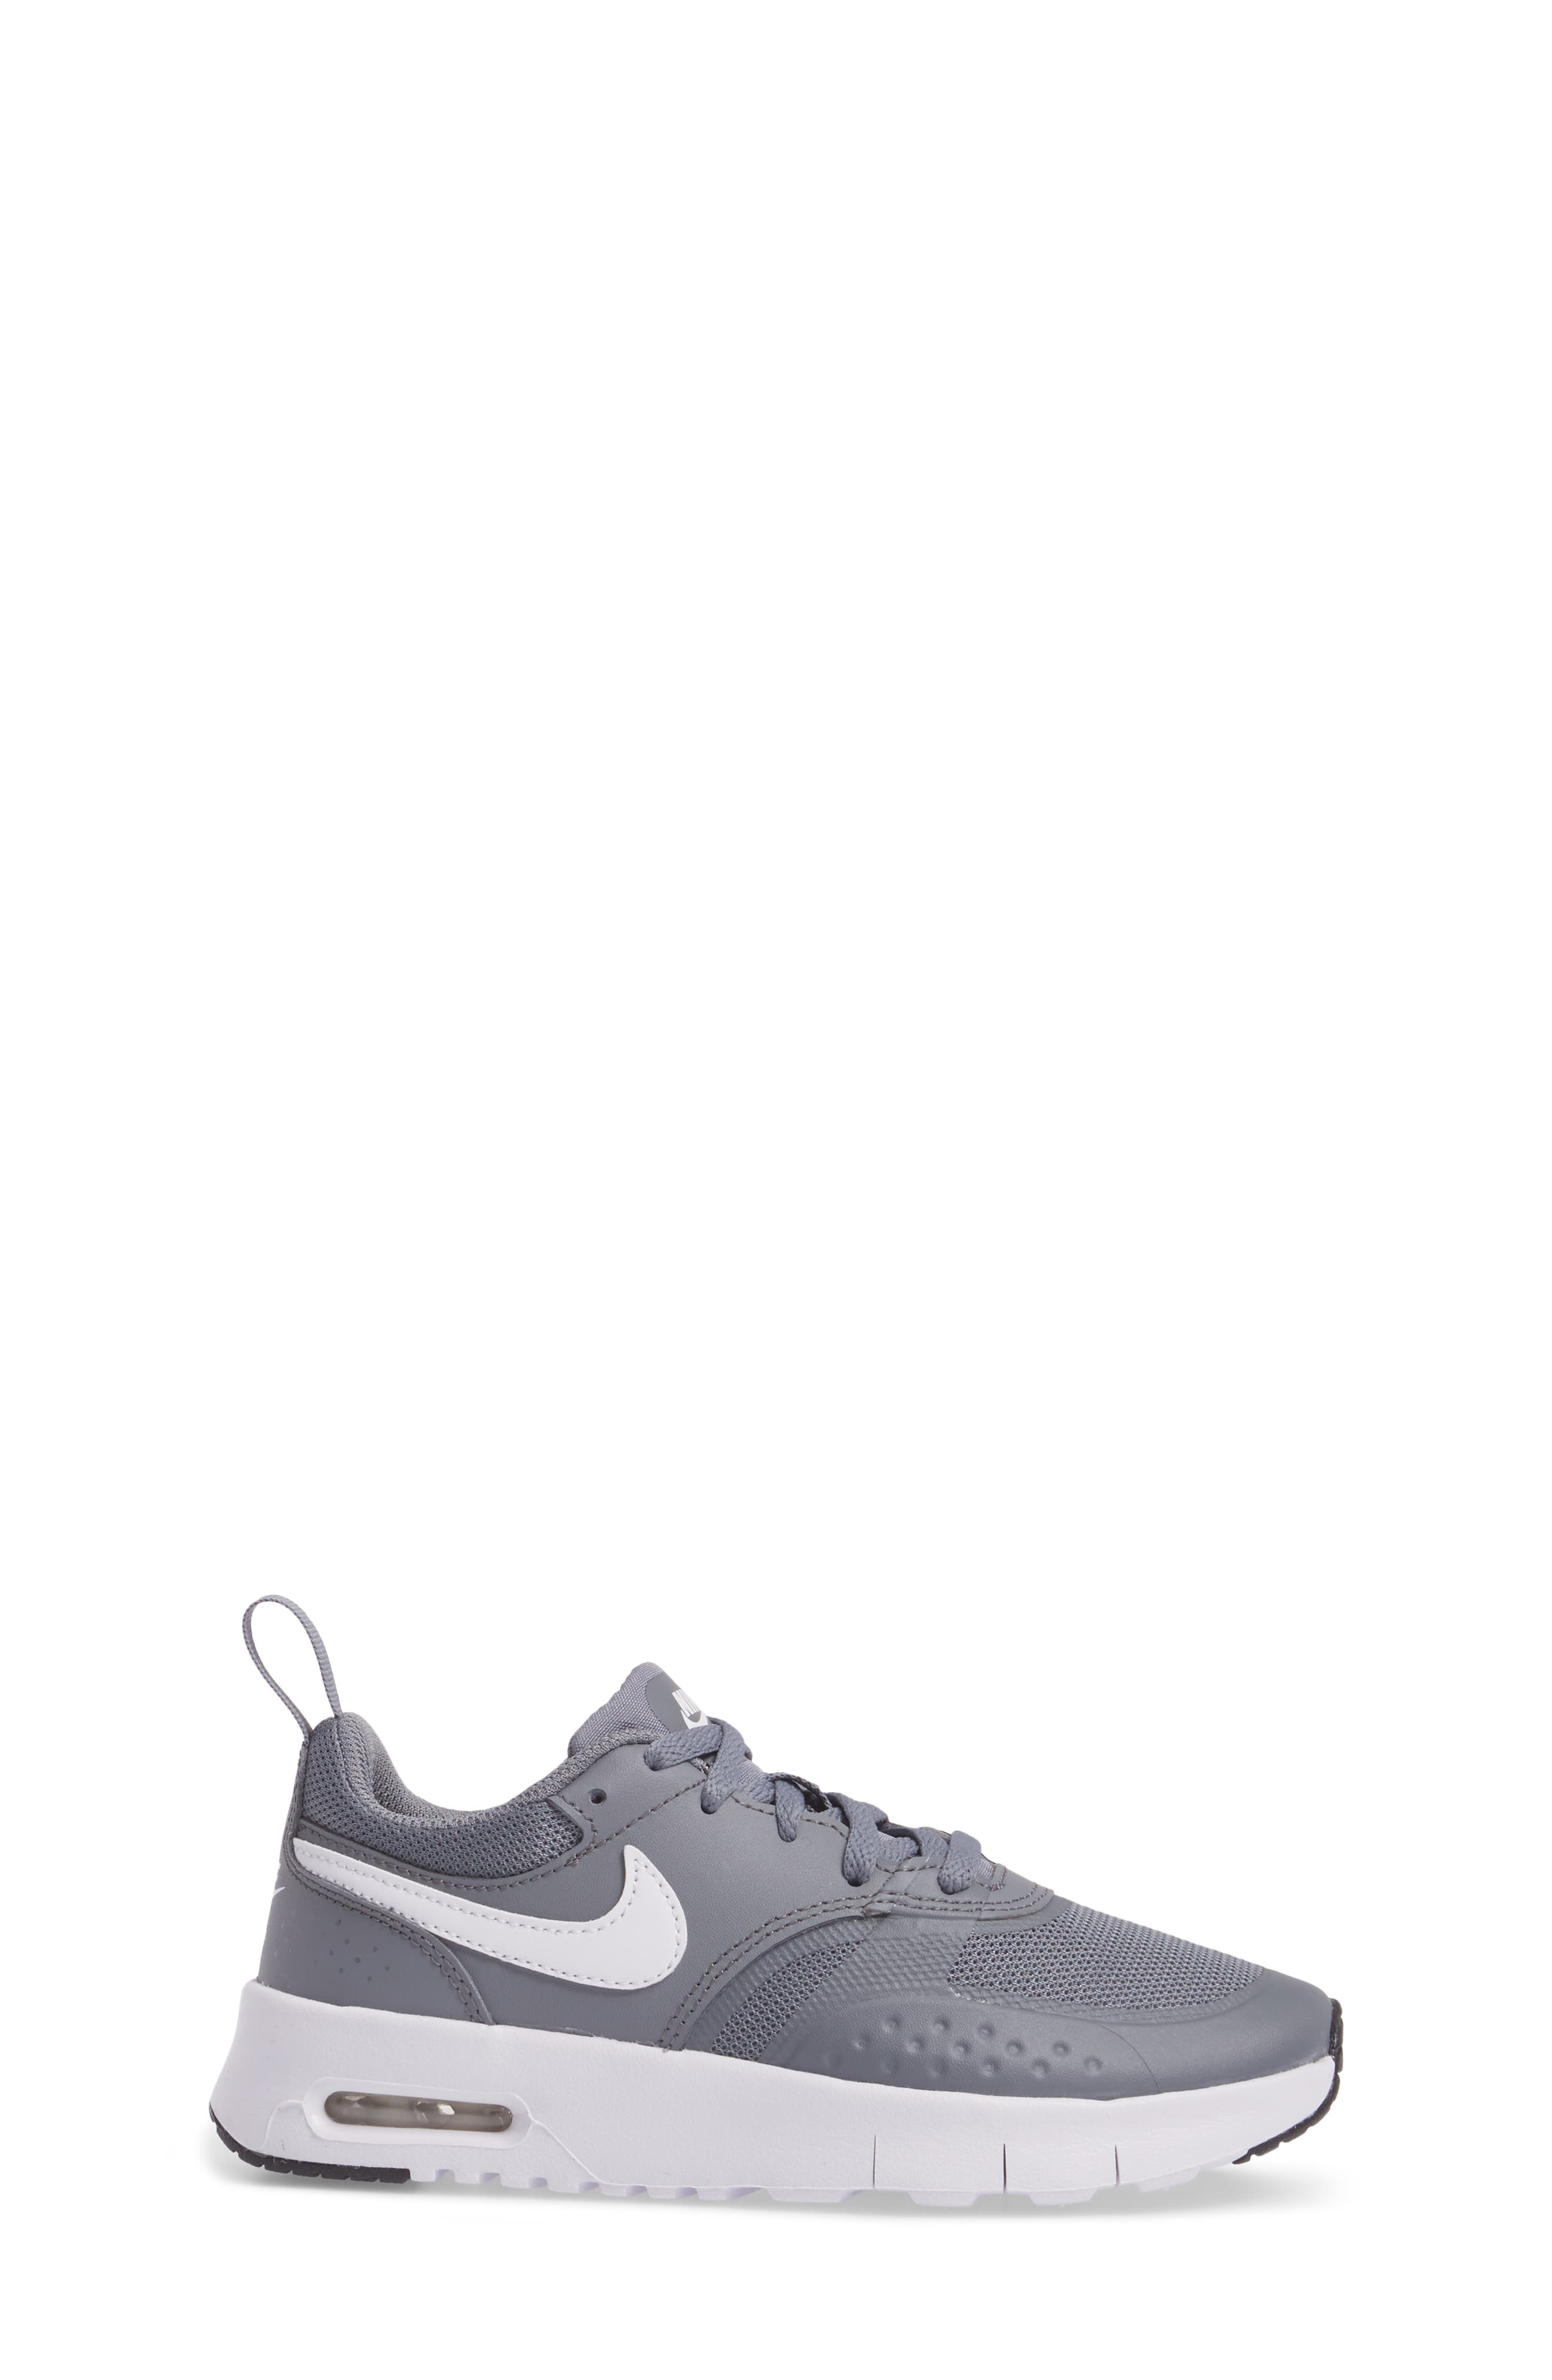 Air Max Vision Sneaker,                             Alternate thumbnail 10, color,